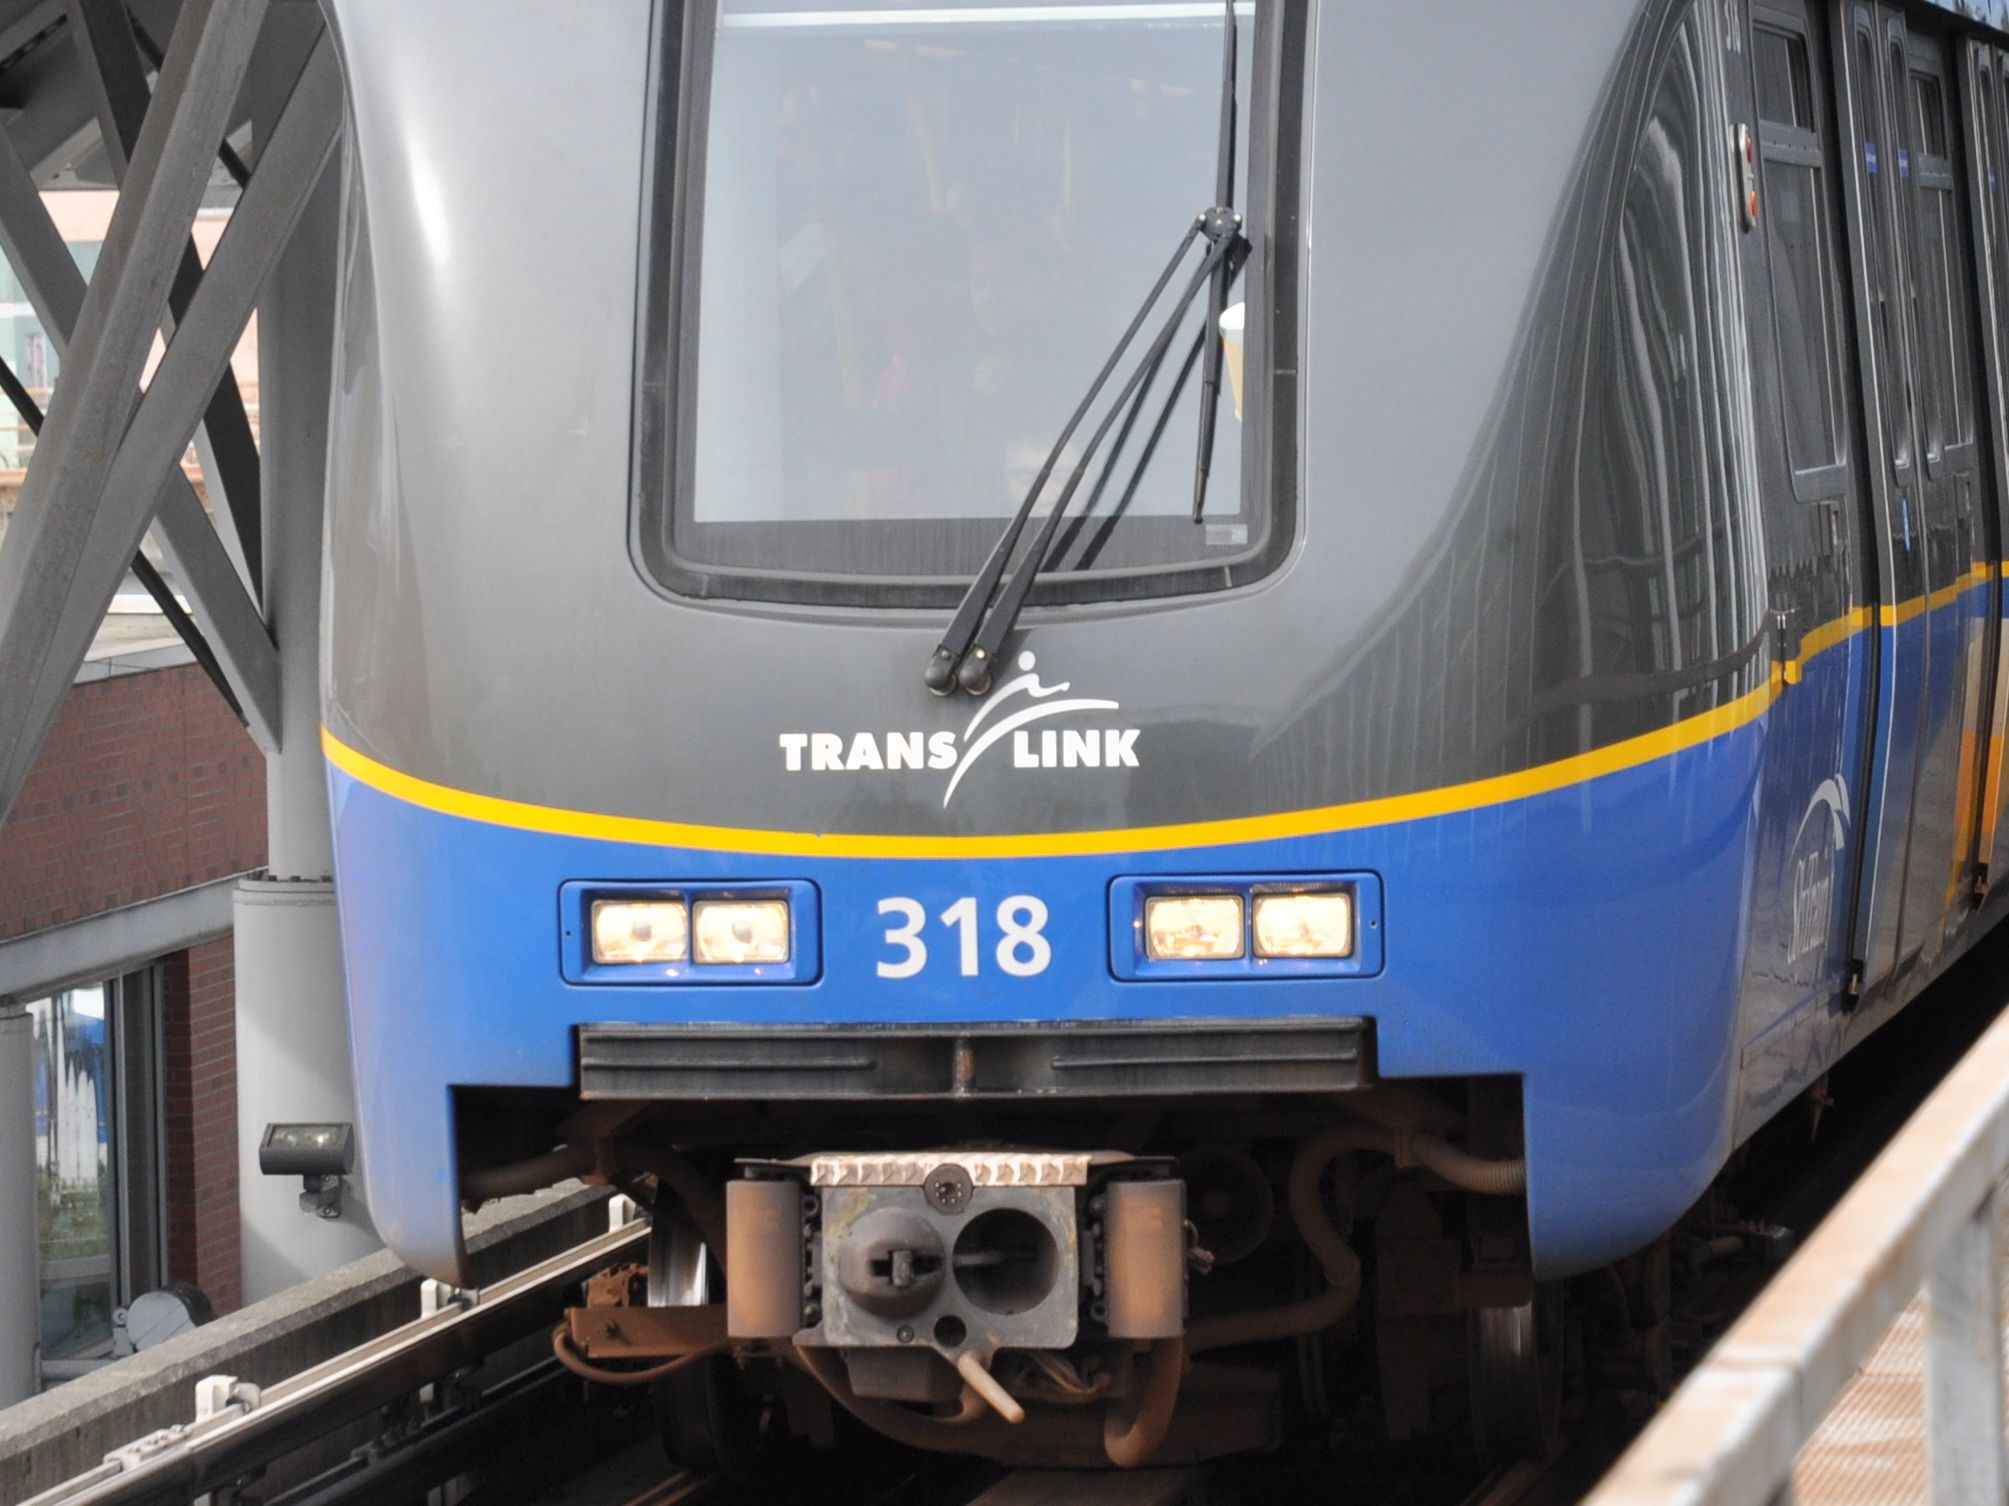 A Translink train at a platform